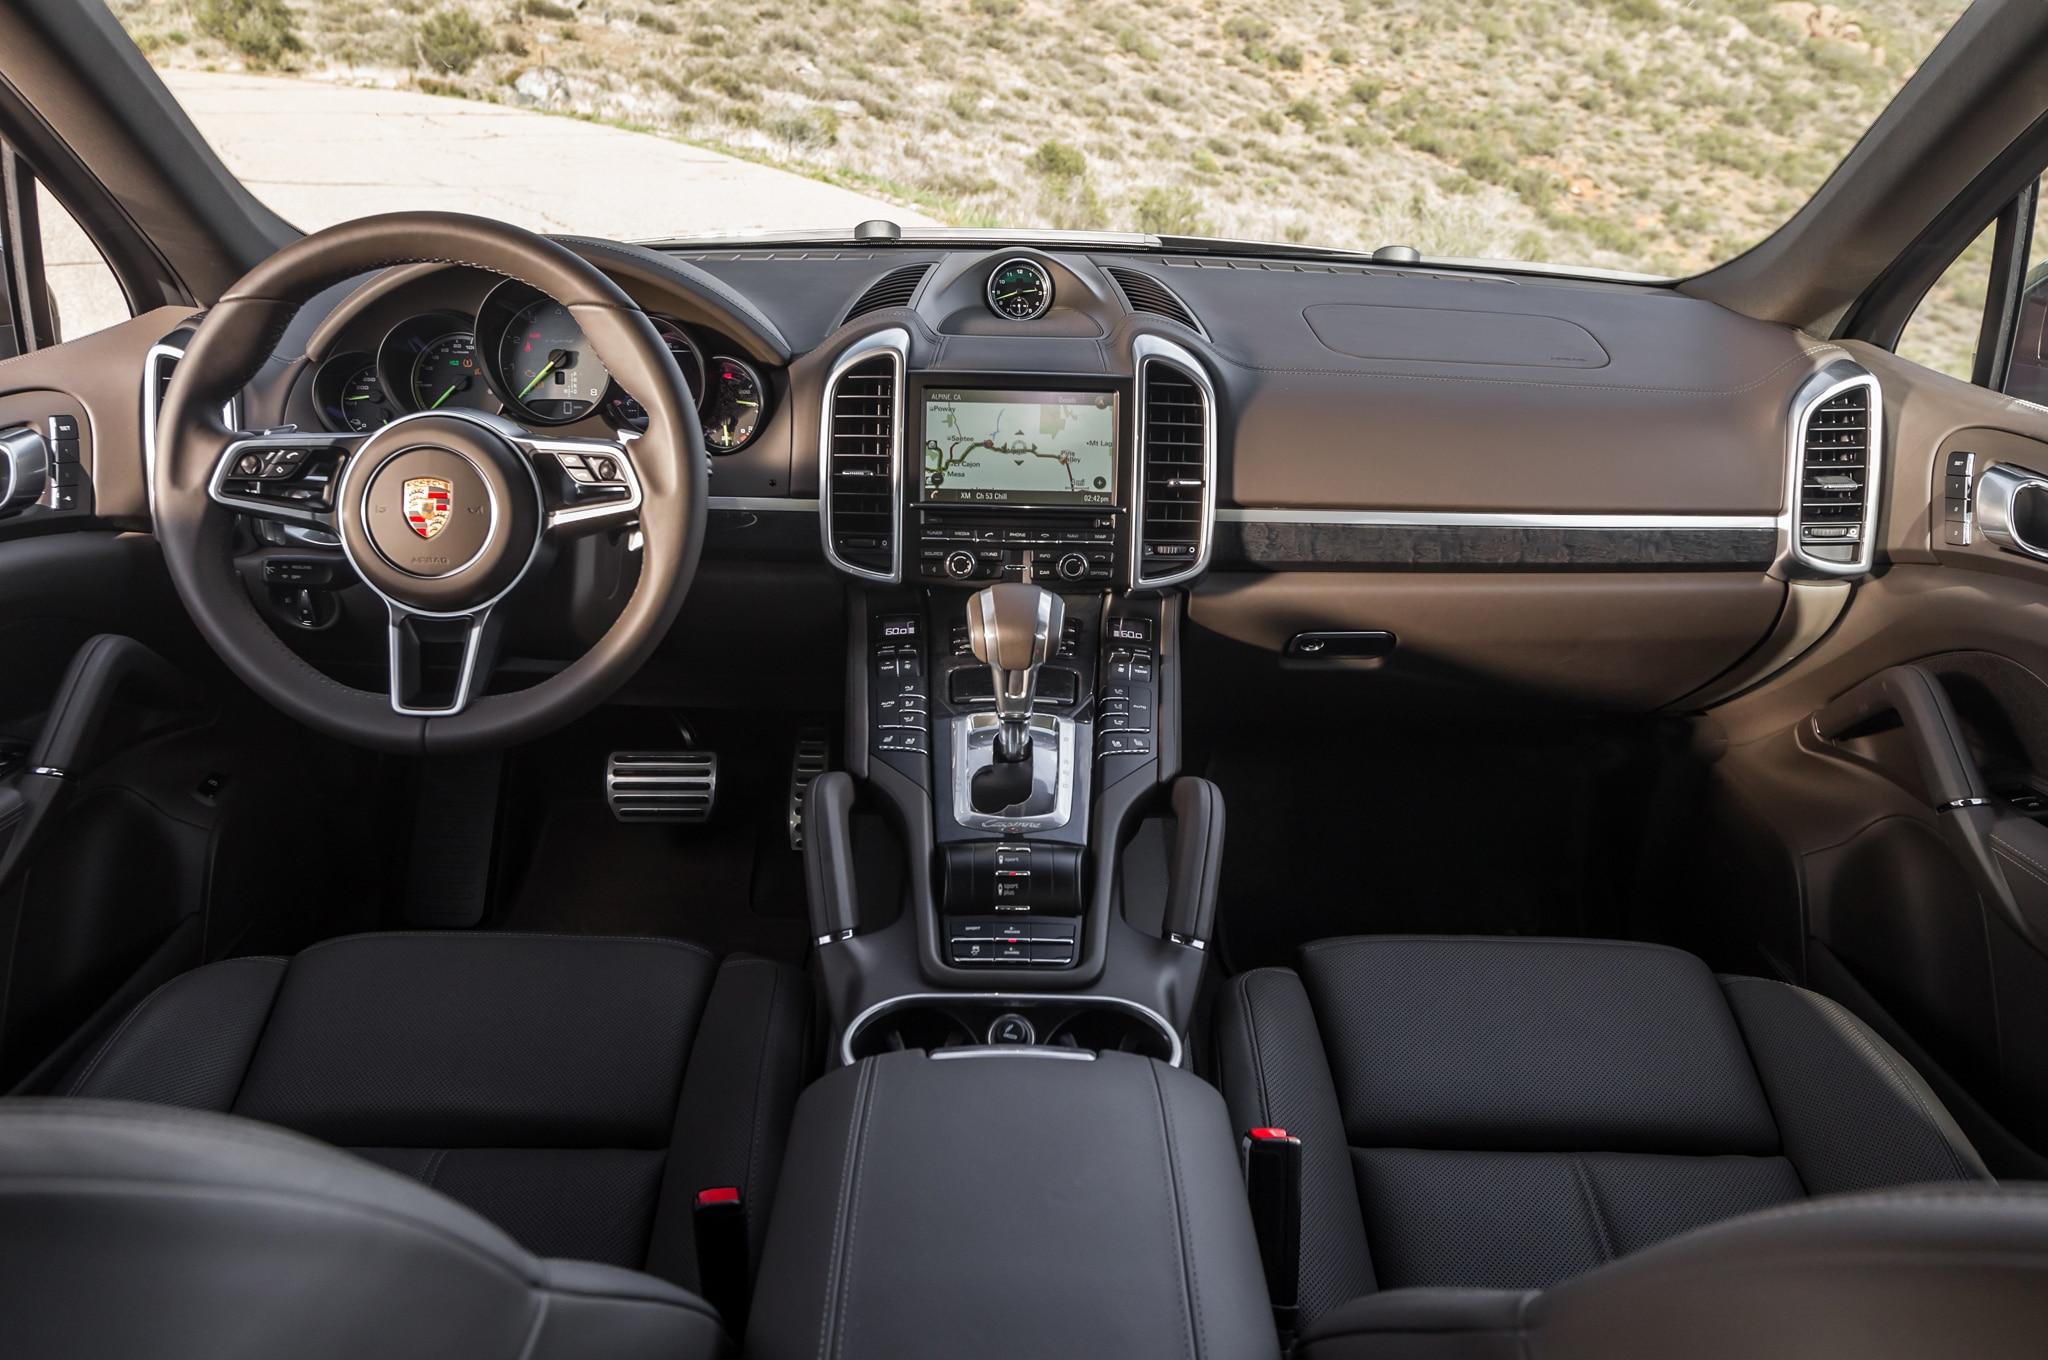 2015 porsche cayenne s e hybrid cockpit - Porsche 2015 Interior